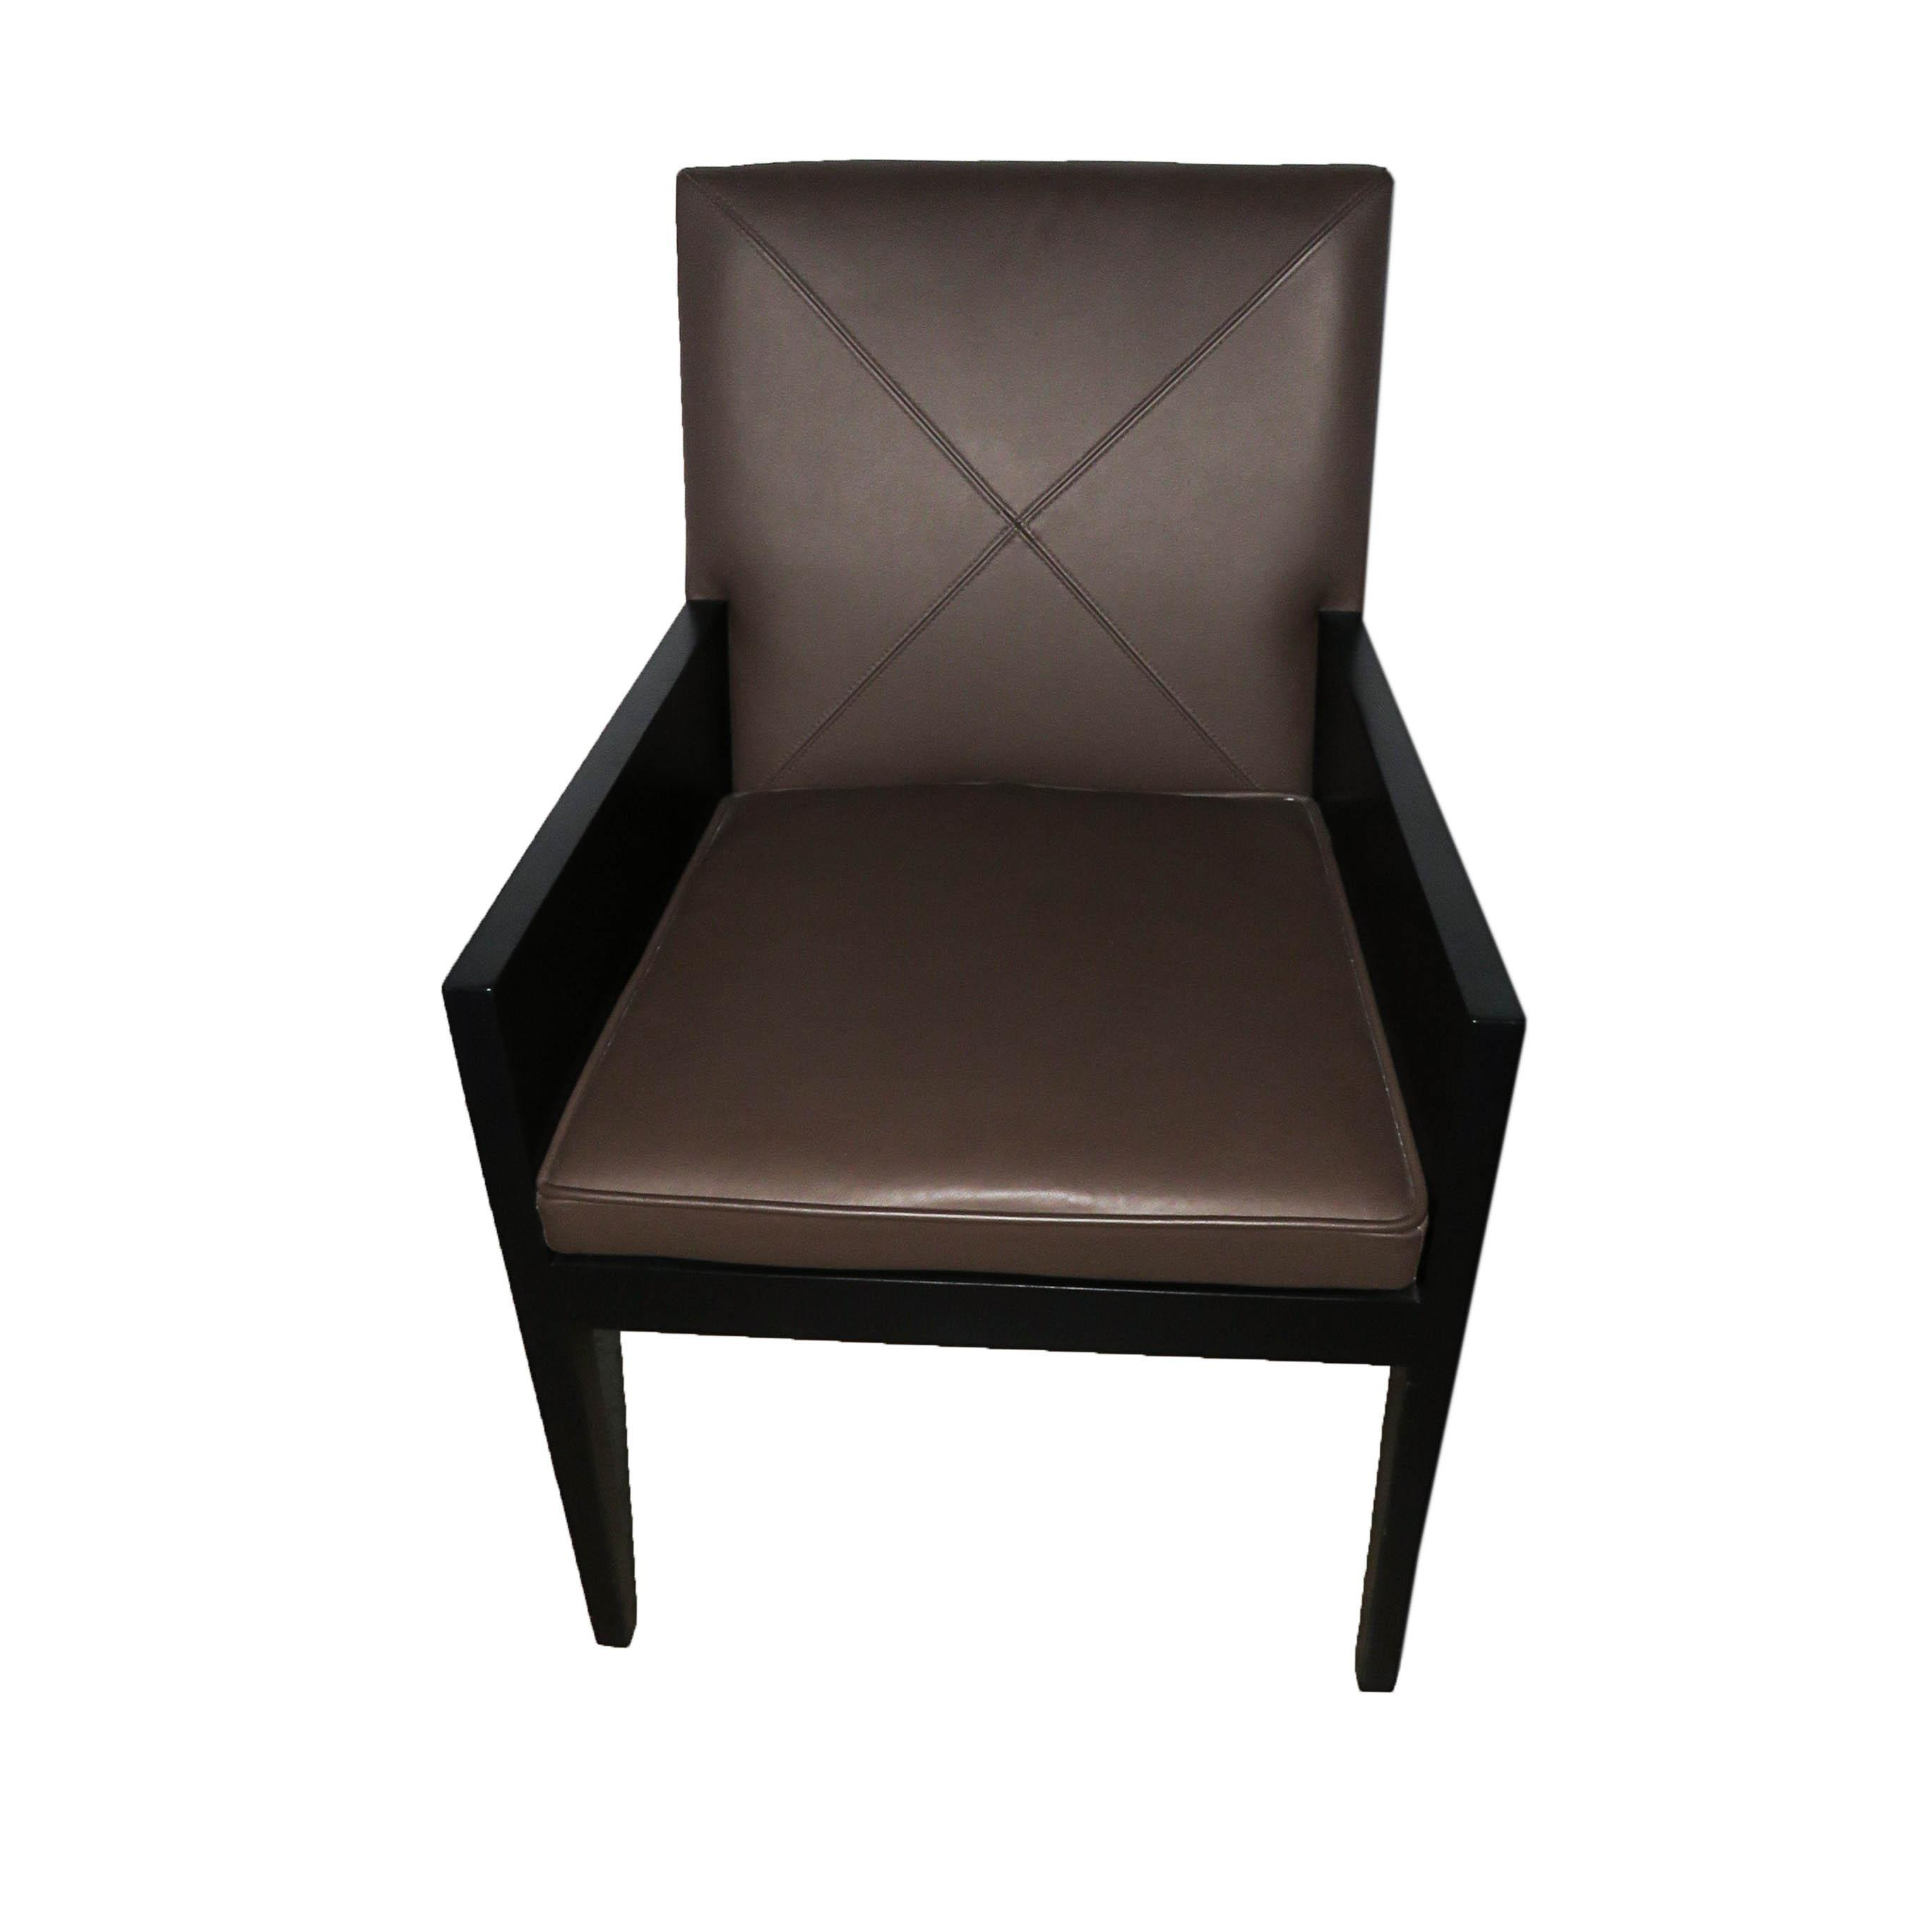 David Edward Berlin Leather Chair